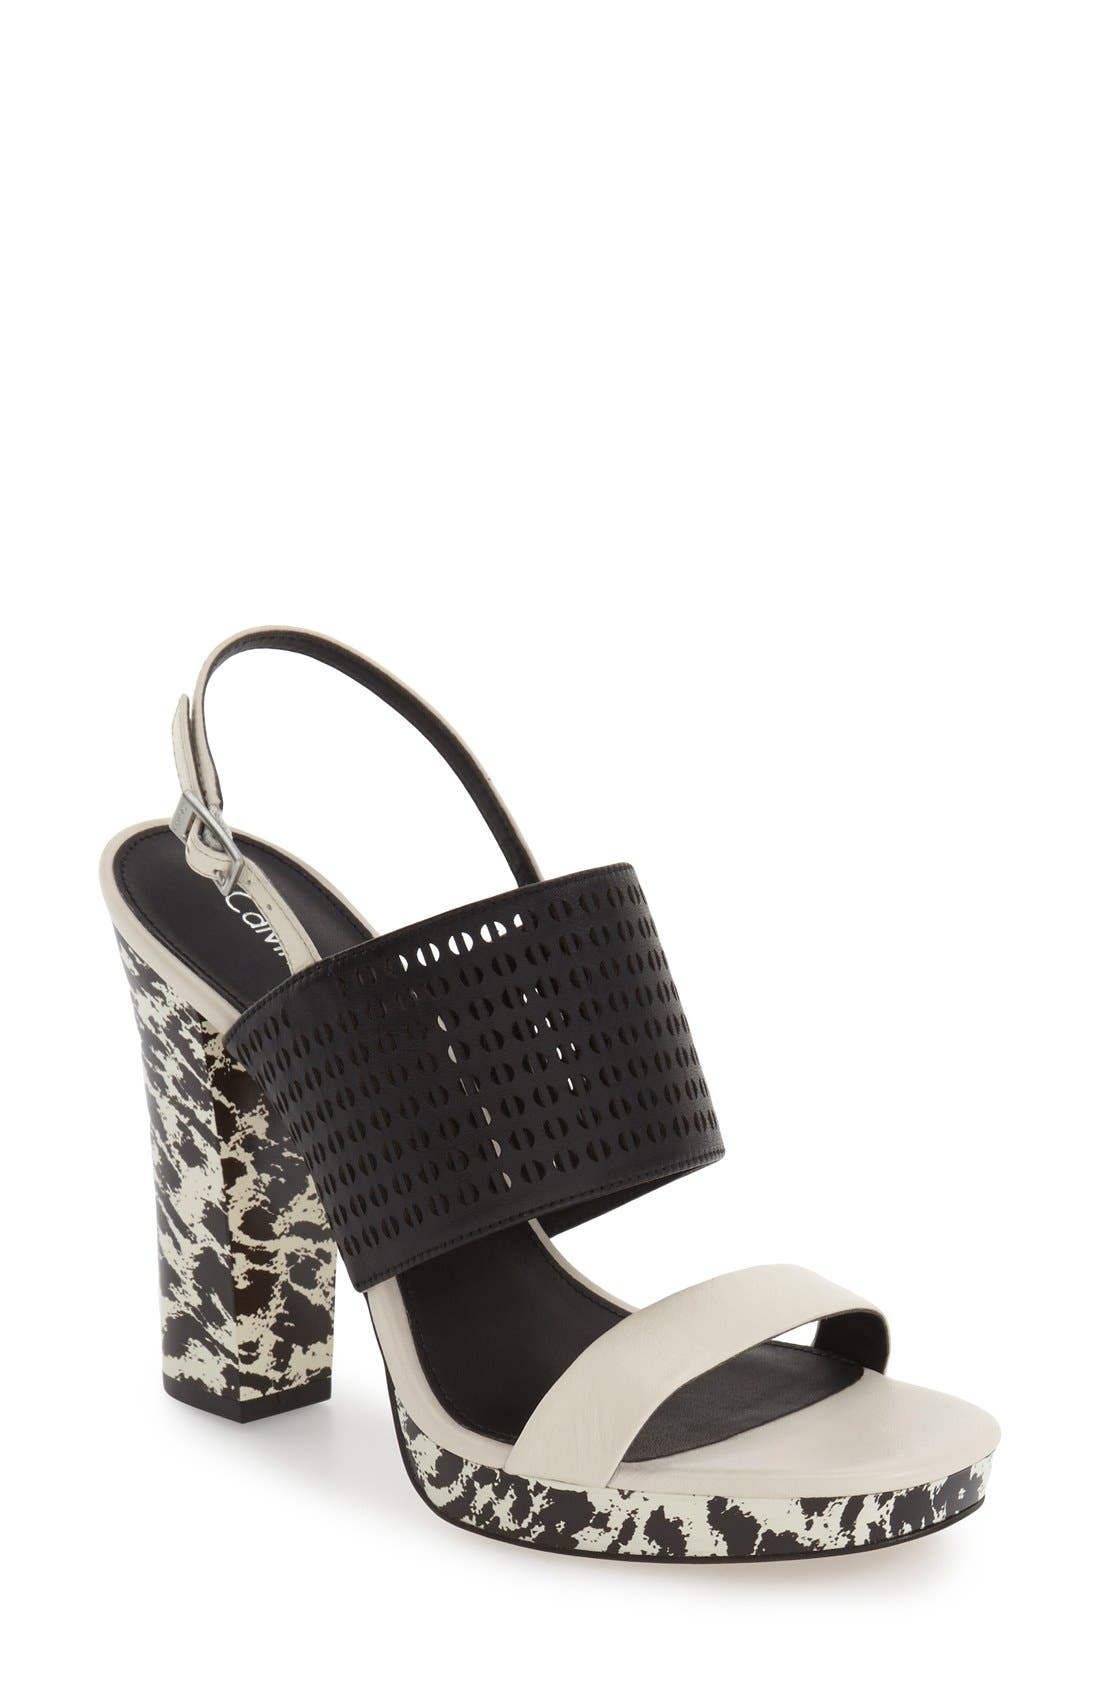 Main Image - Calvin Klein 'Breannie' Slingback Platform Sandal (Women)